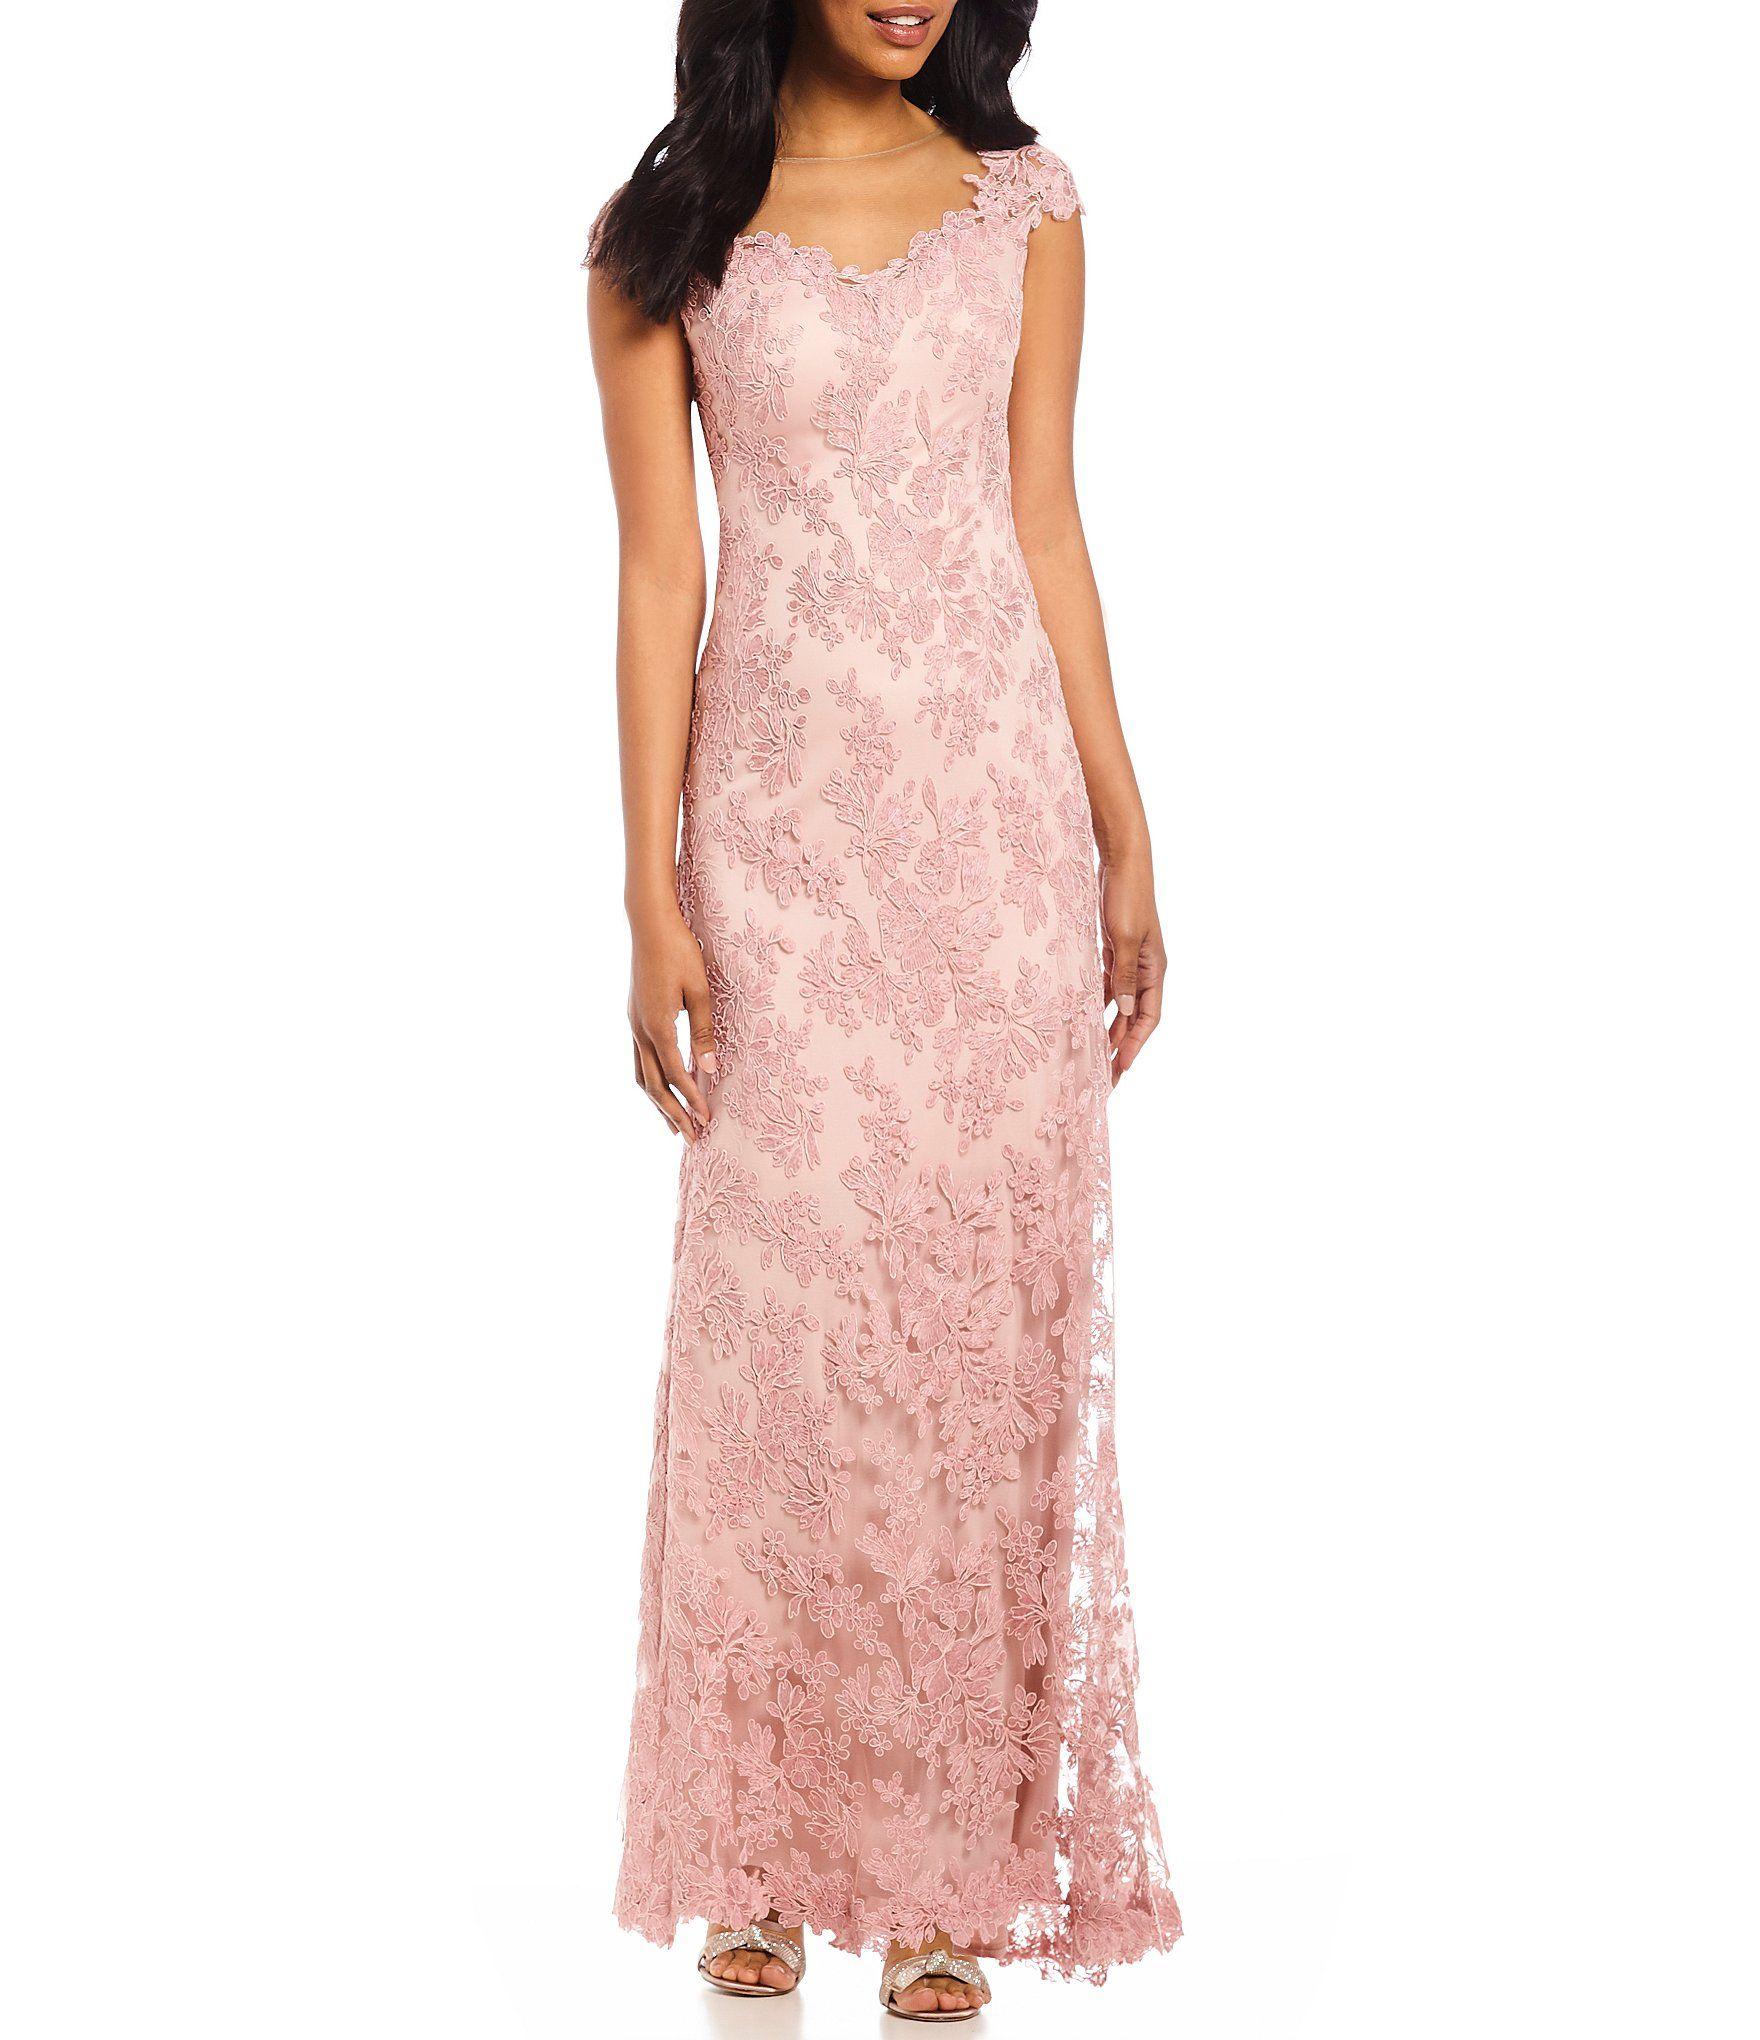 Asombroso Vestido De Novia Dillards Ideas Ornamento Elaboración ...